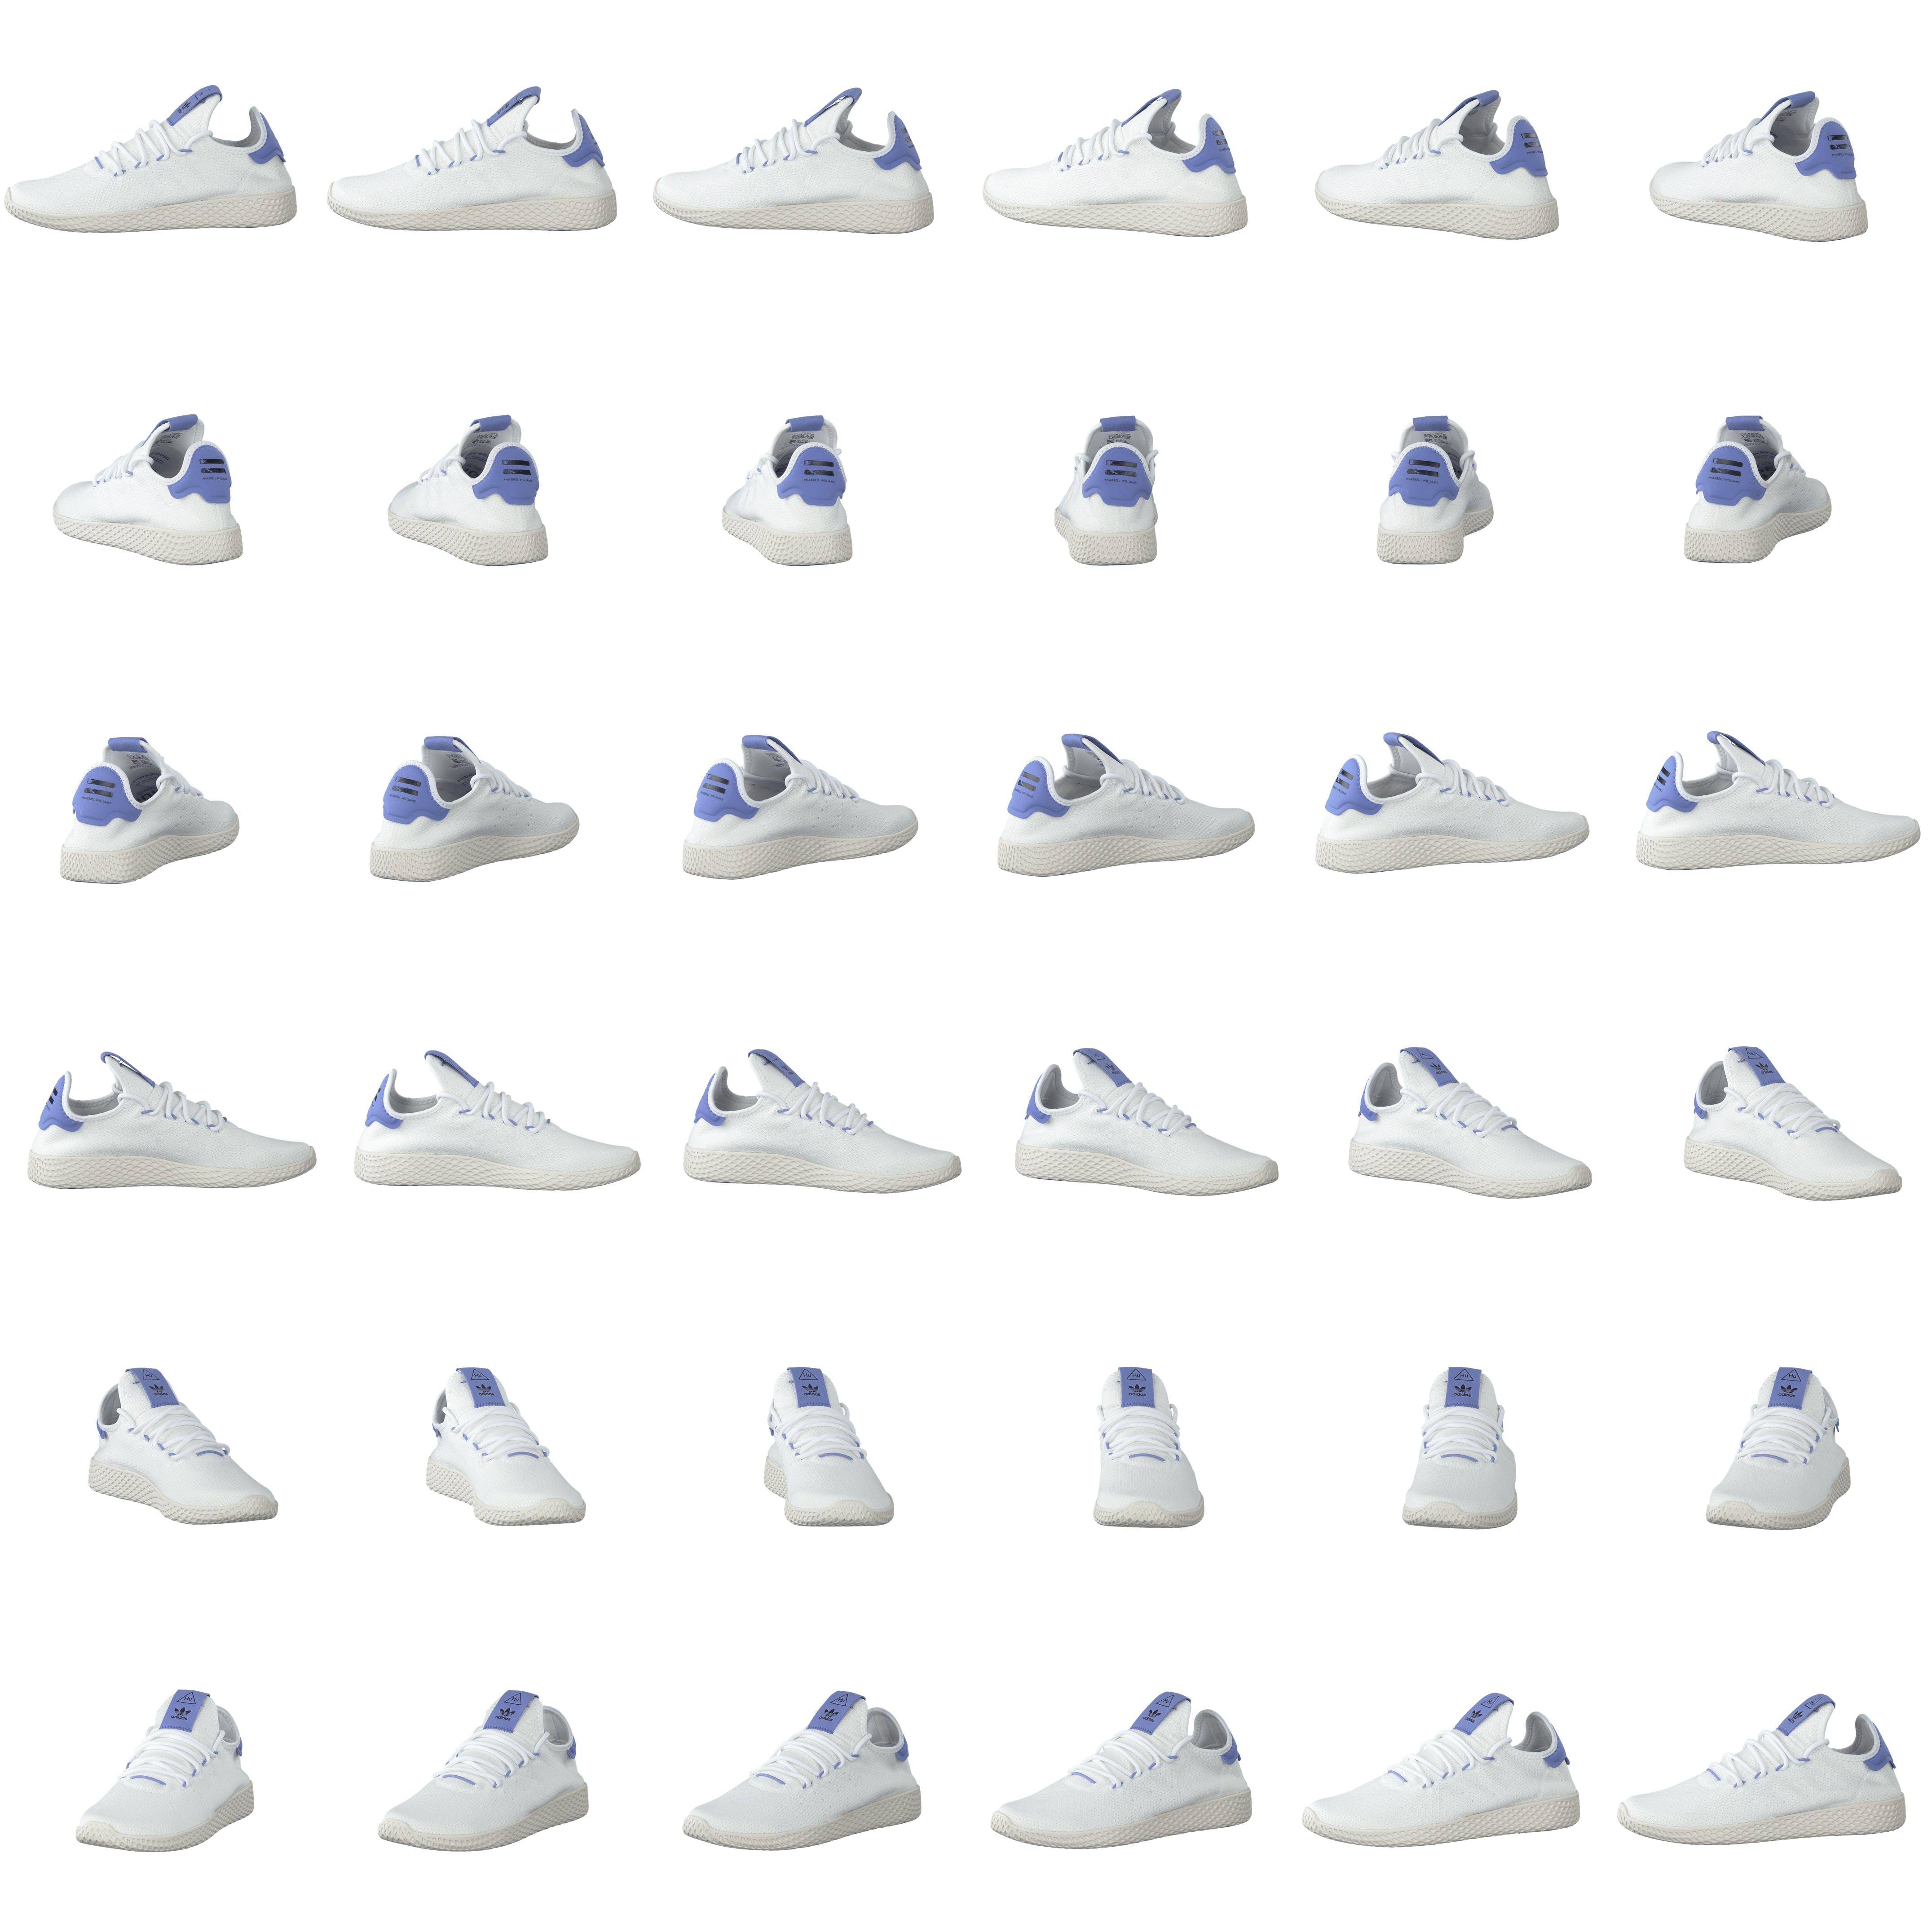 Kjøp adidas Originals Pw Tennis Hu Ftwwhtrealilcwhite sko